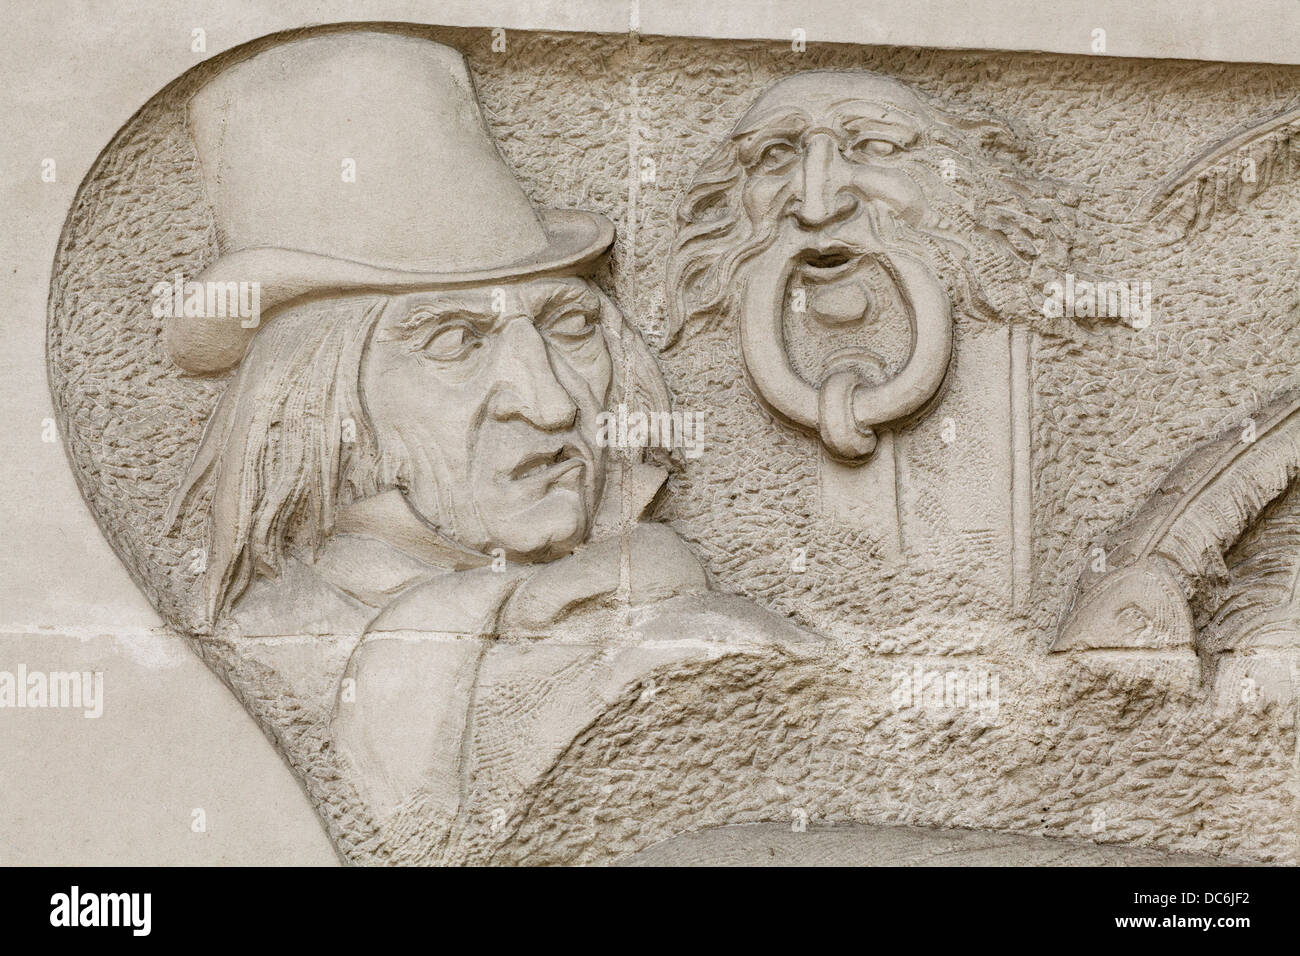 Ebenezer Scrooge Christmas Carol Characters.Charles Dickens And Characters In Marylebone Road London